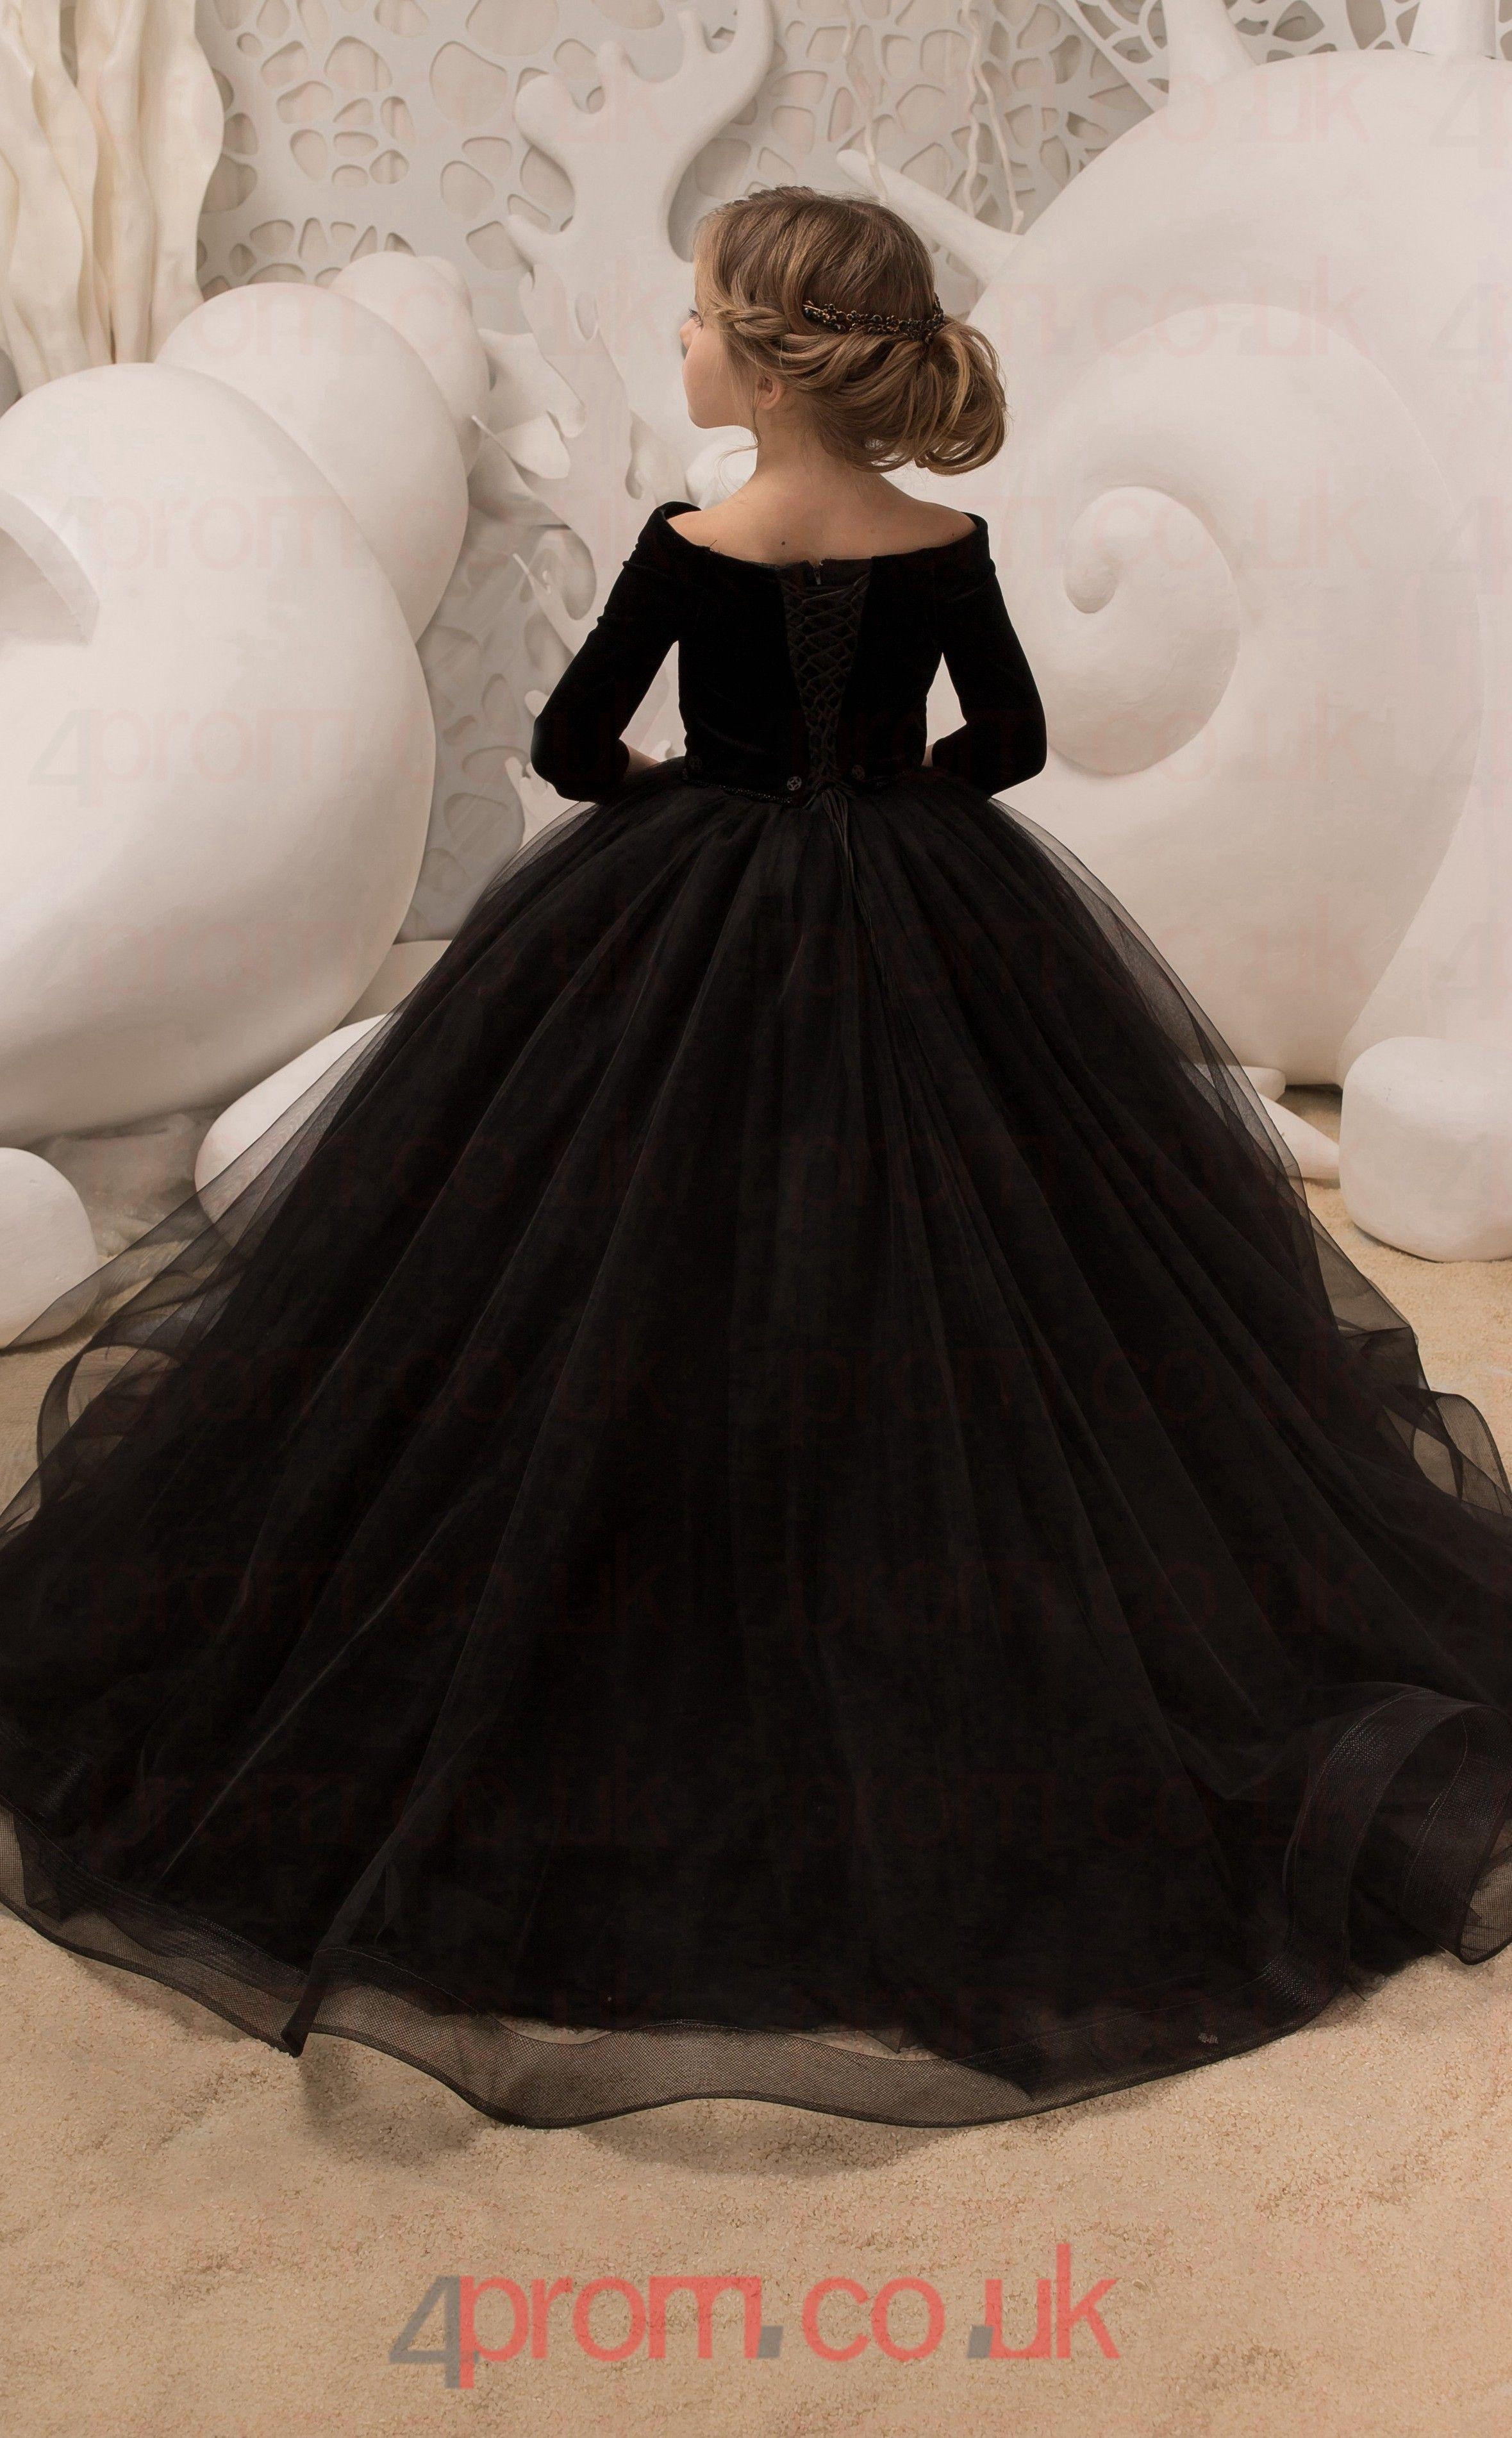 Scalloped 3 4 Length Sleeve Black Kids Prom Dresses Chk037 4prom Co Uk Kids Prom Dresses Kids Gown Wedding Dresses For Kids [ 3803 x 2359 Pixel ]